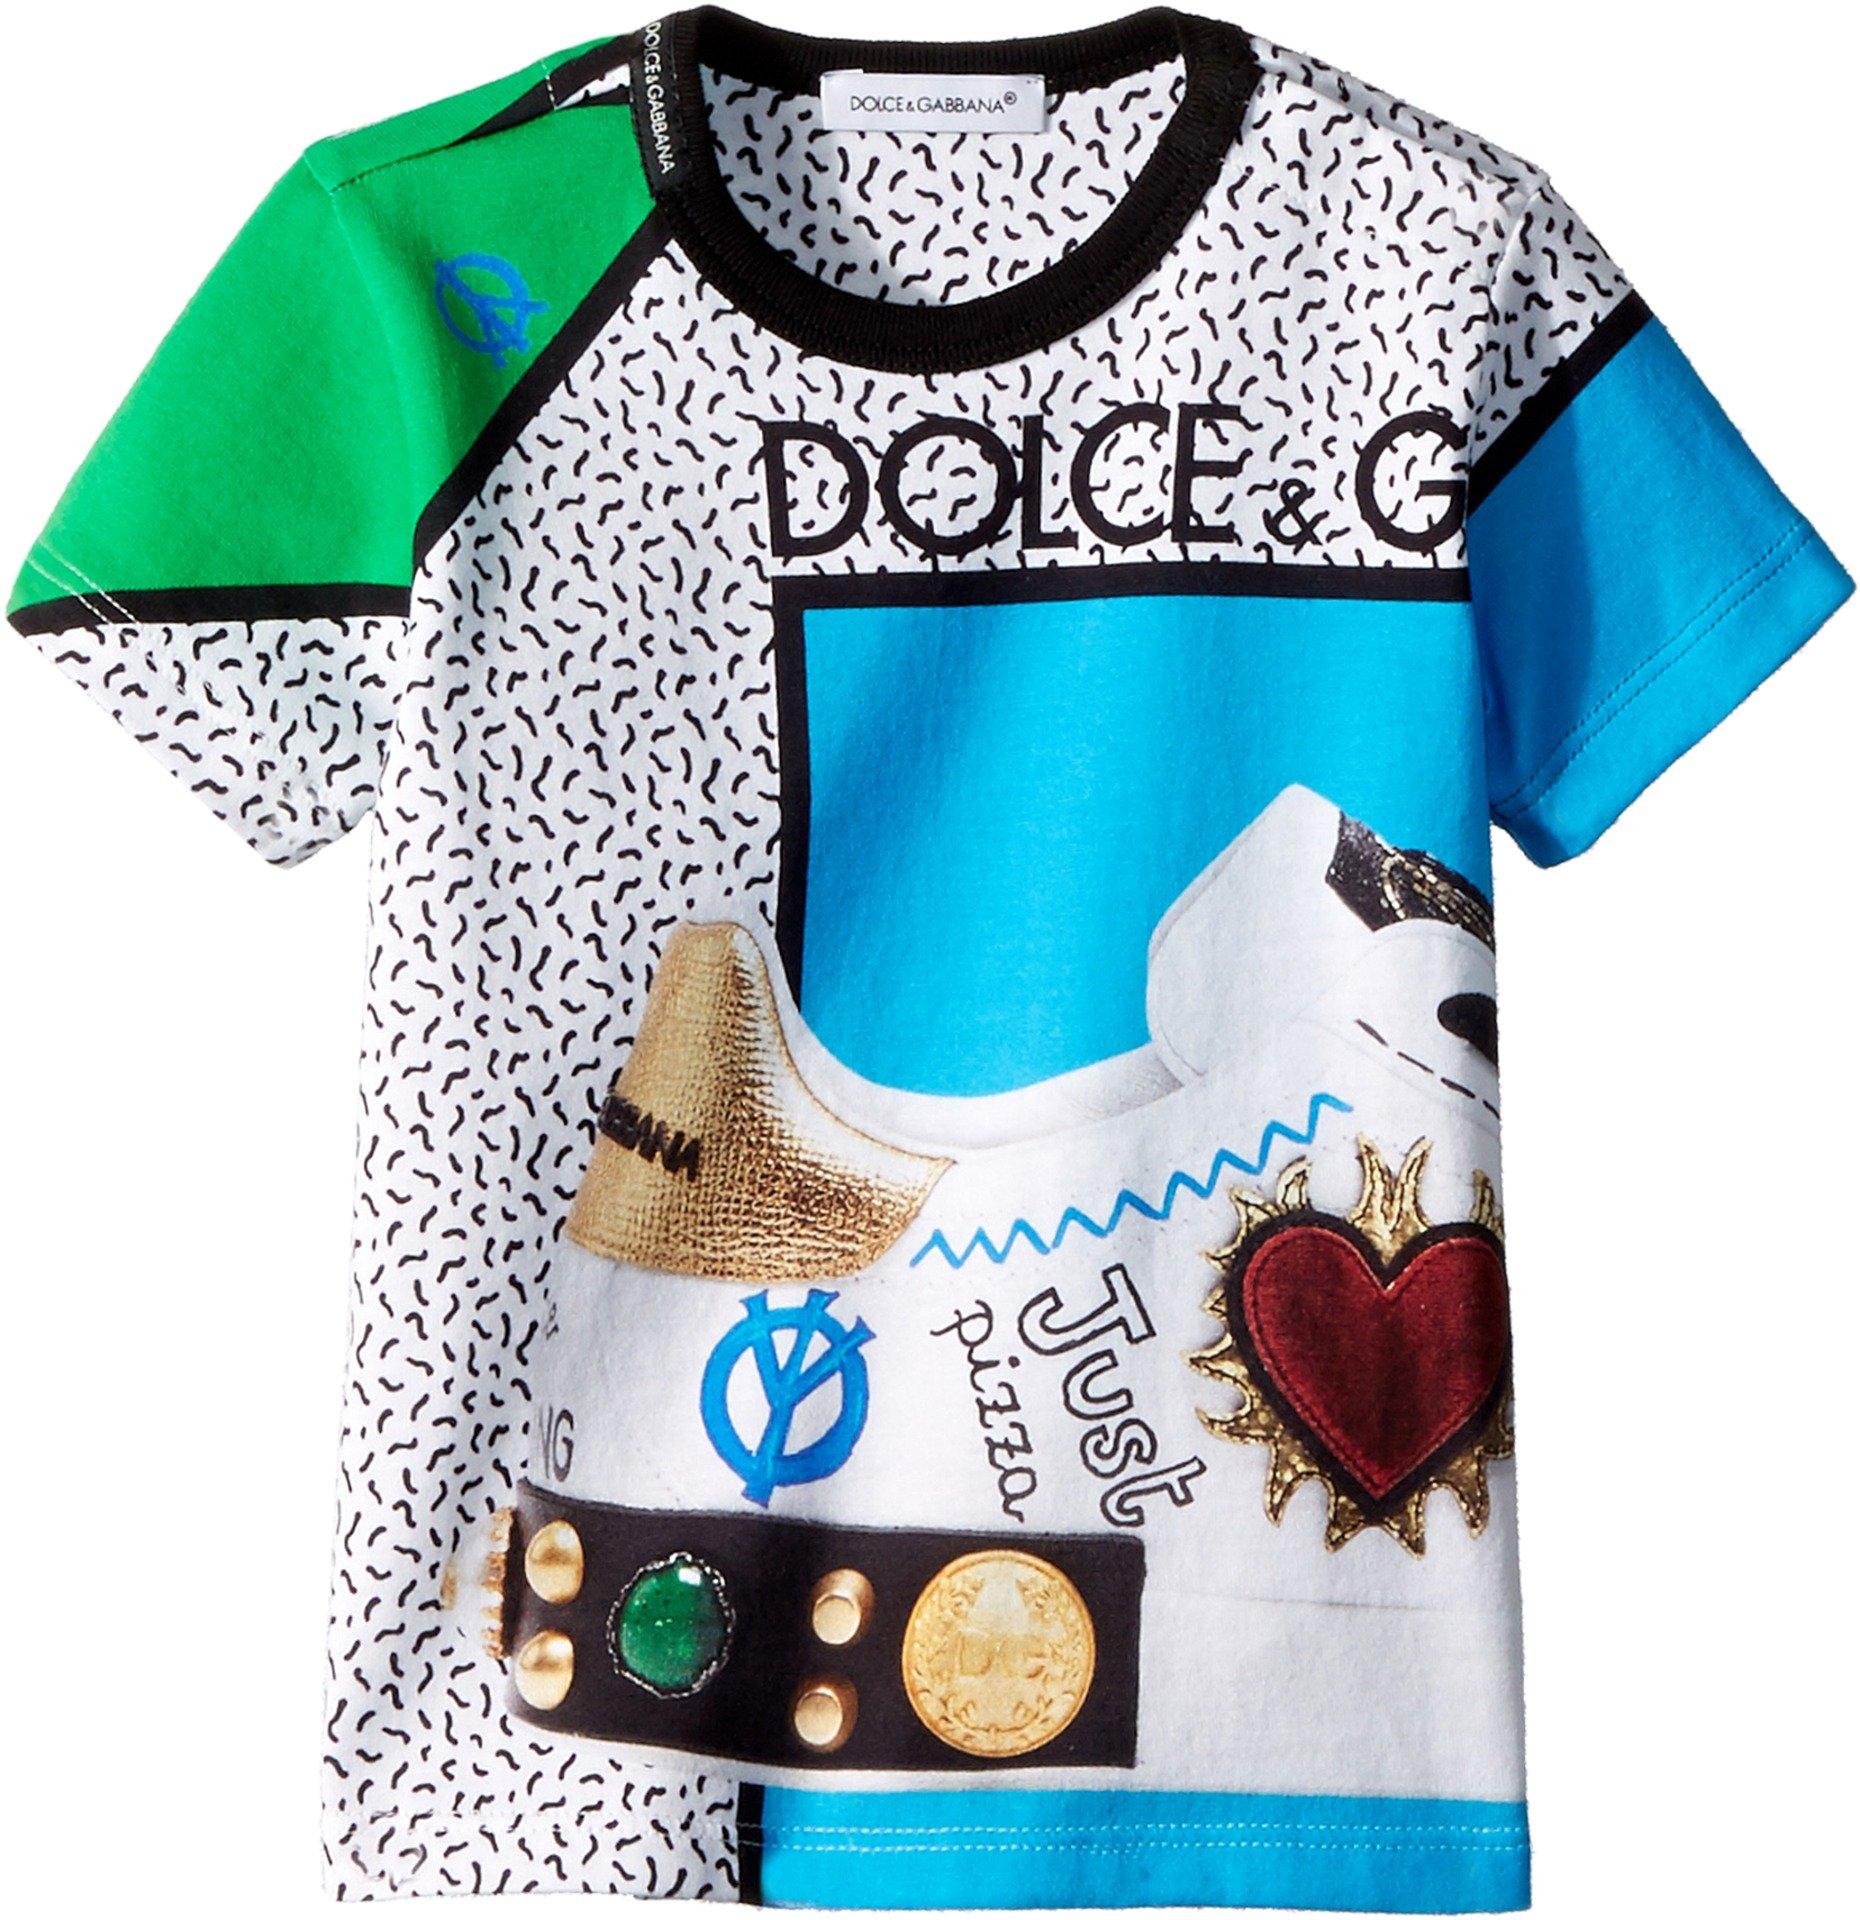 Dolce & Gabbana Kids Baby Boy's Scarpe Print T-Shirt (Infant) Turquoise 6-9 Months